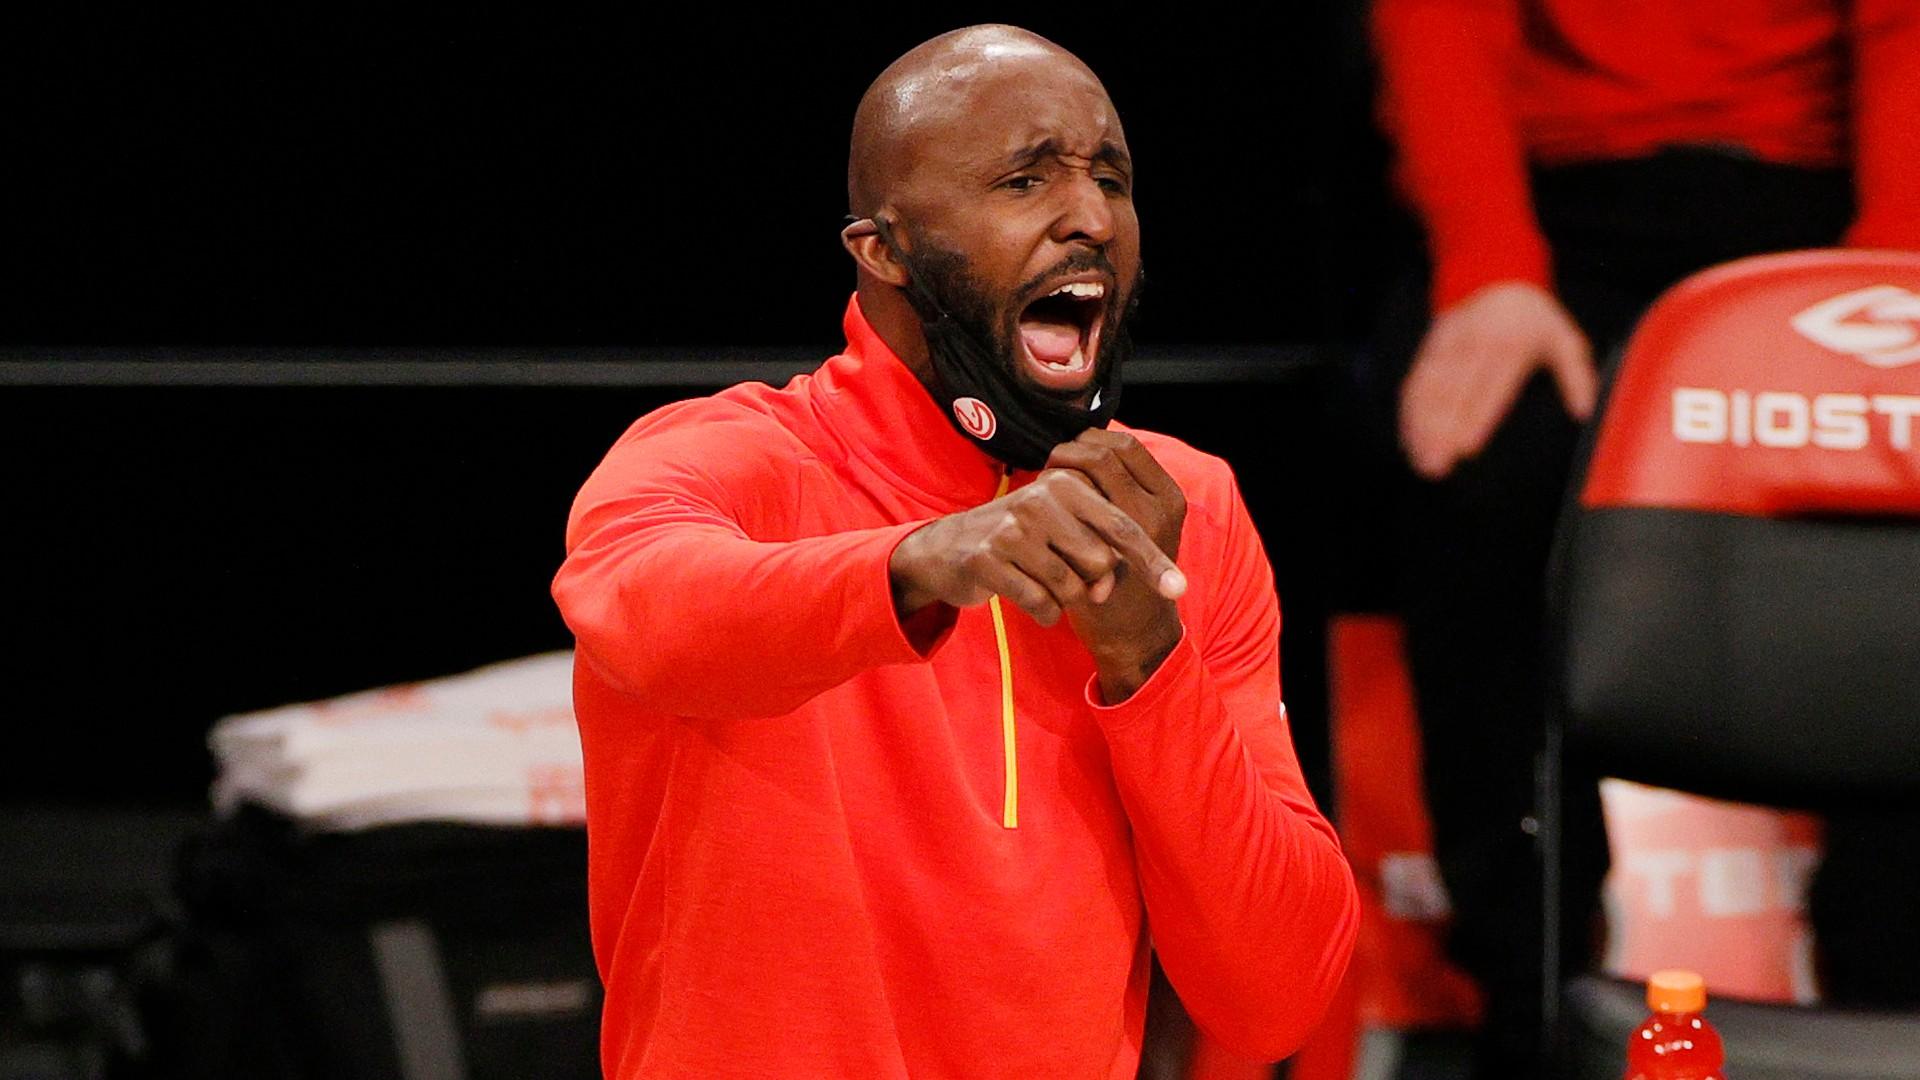 Hawks fire Lloyd Pierce; Nate McMillan to serve as interim head coach